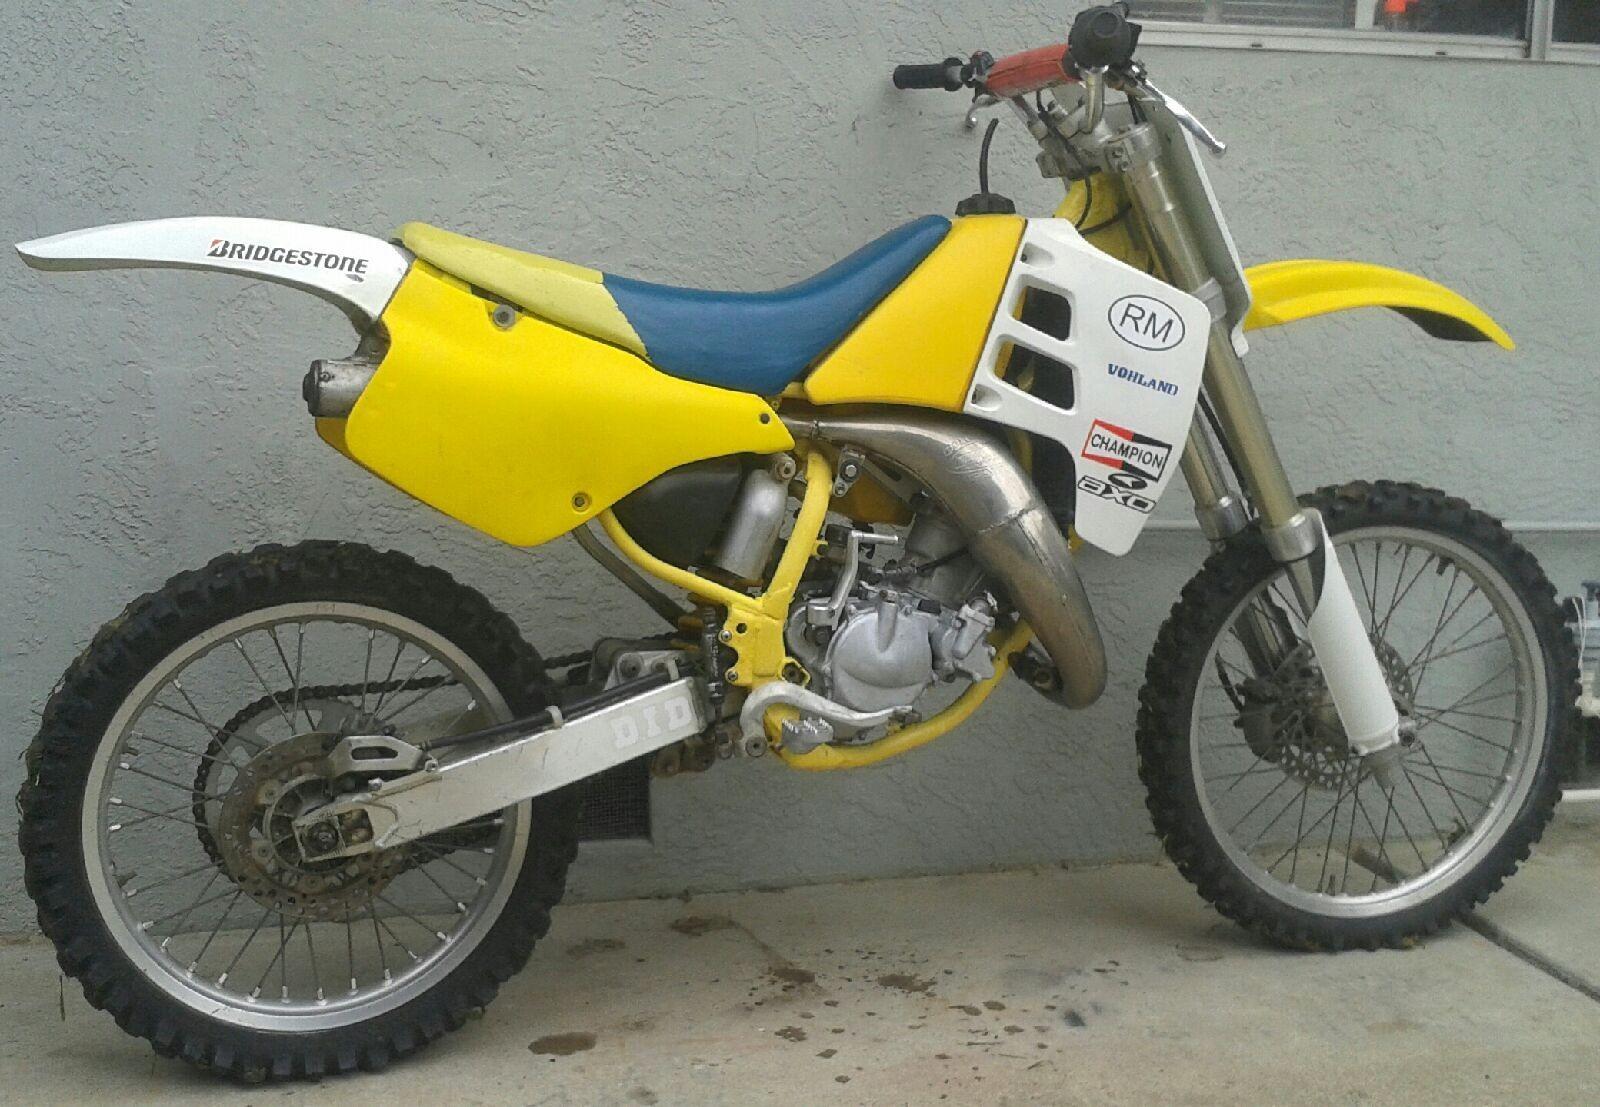 1991 suzuki rm125 progress mixon848 motocross pictures. Black Bedroom Furniture Sets. Home Design Ideas